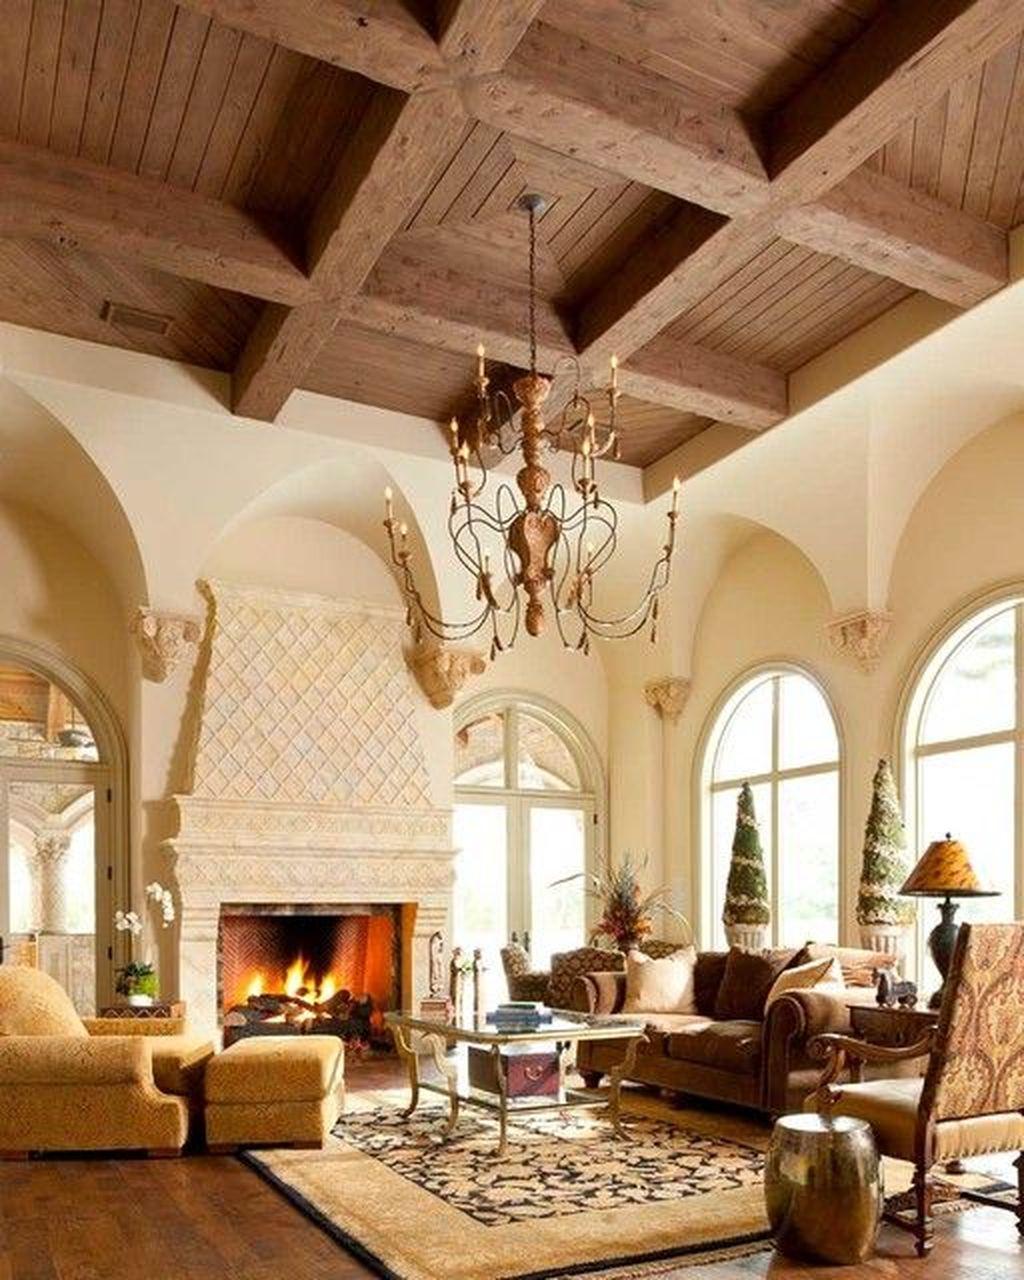 31 Enjoying Mediterranean Style Design Ideas For Your Home Décor